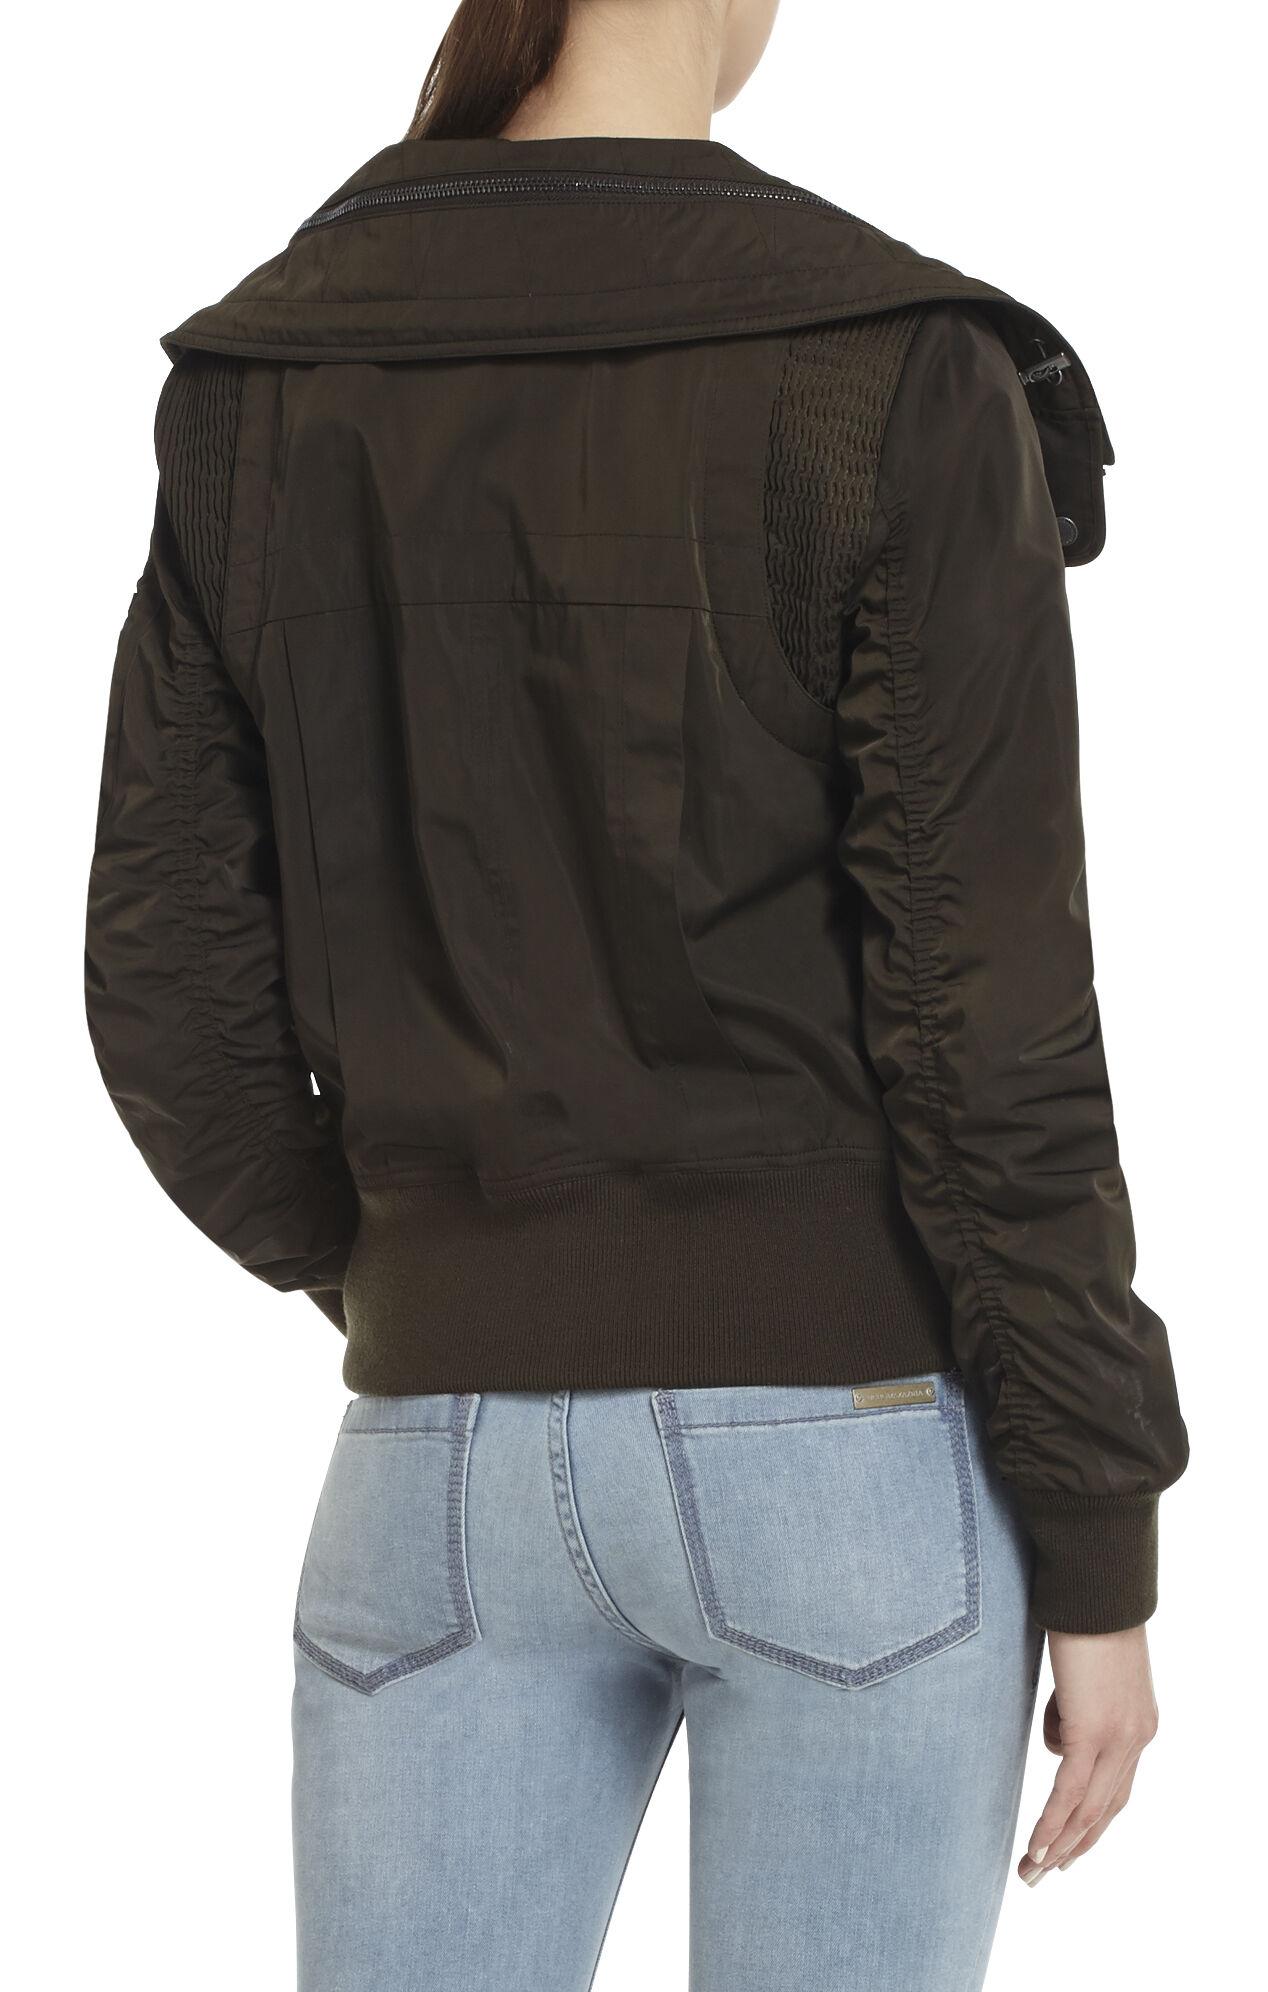 Lacy Bomber Jacket